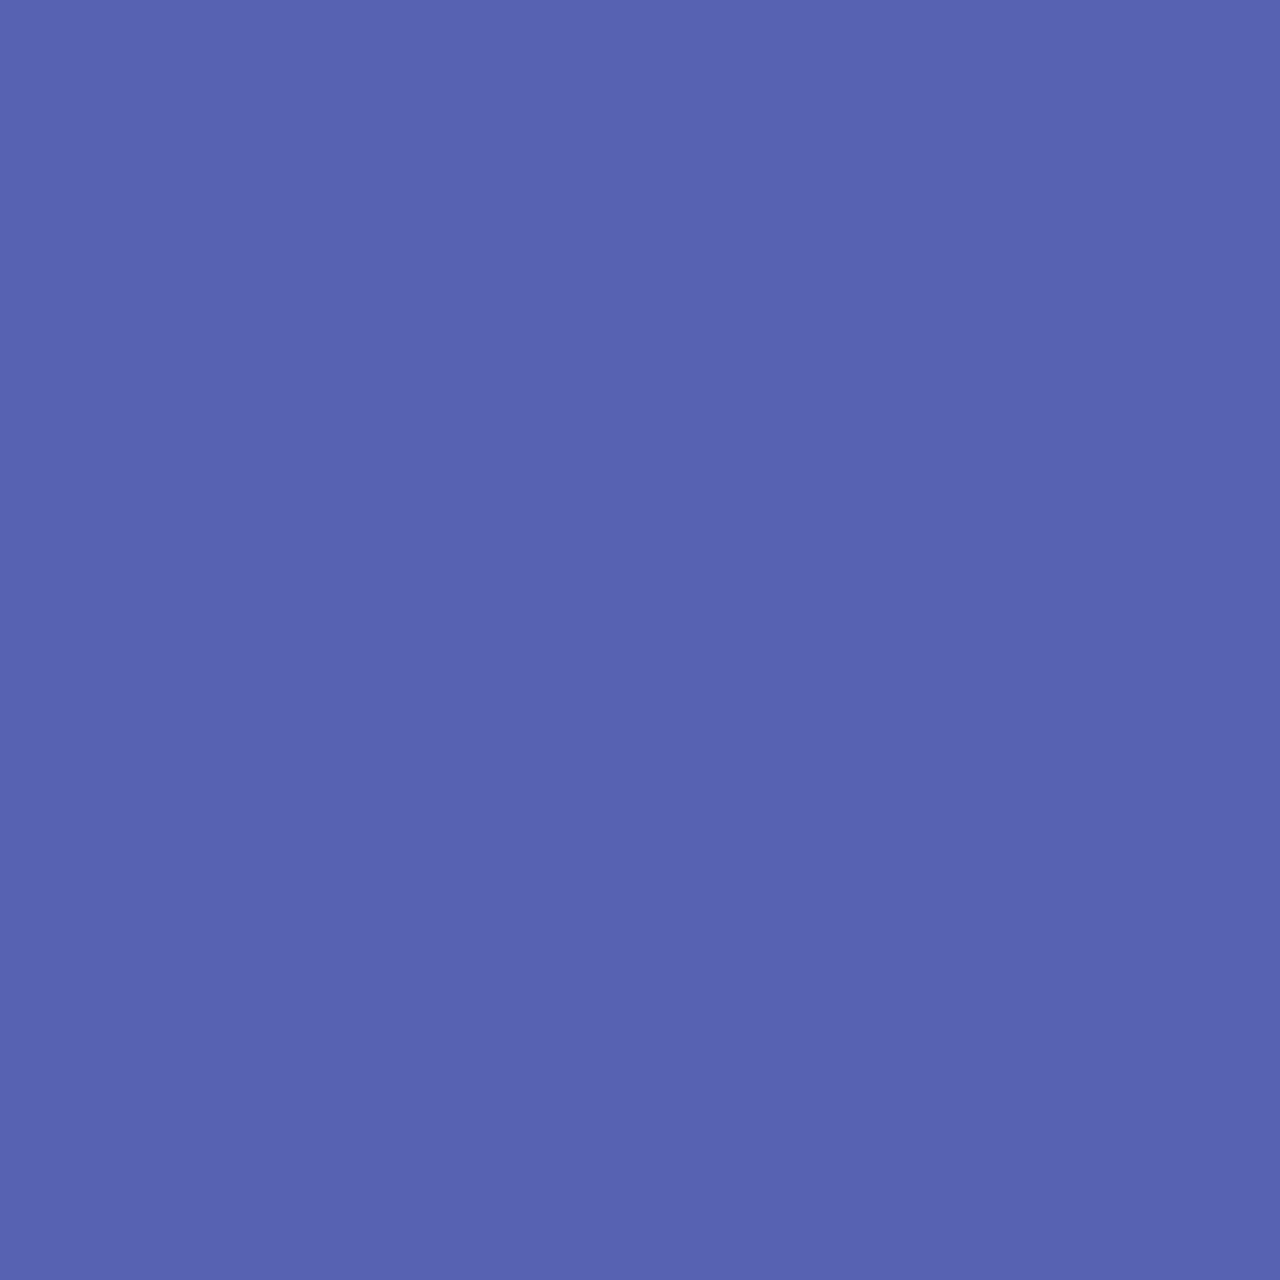 Colorworks Premium Solid Grape Hyacinth 9000 630